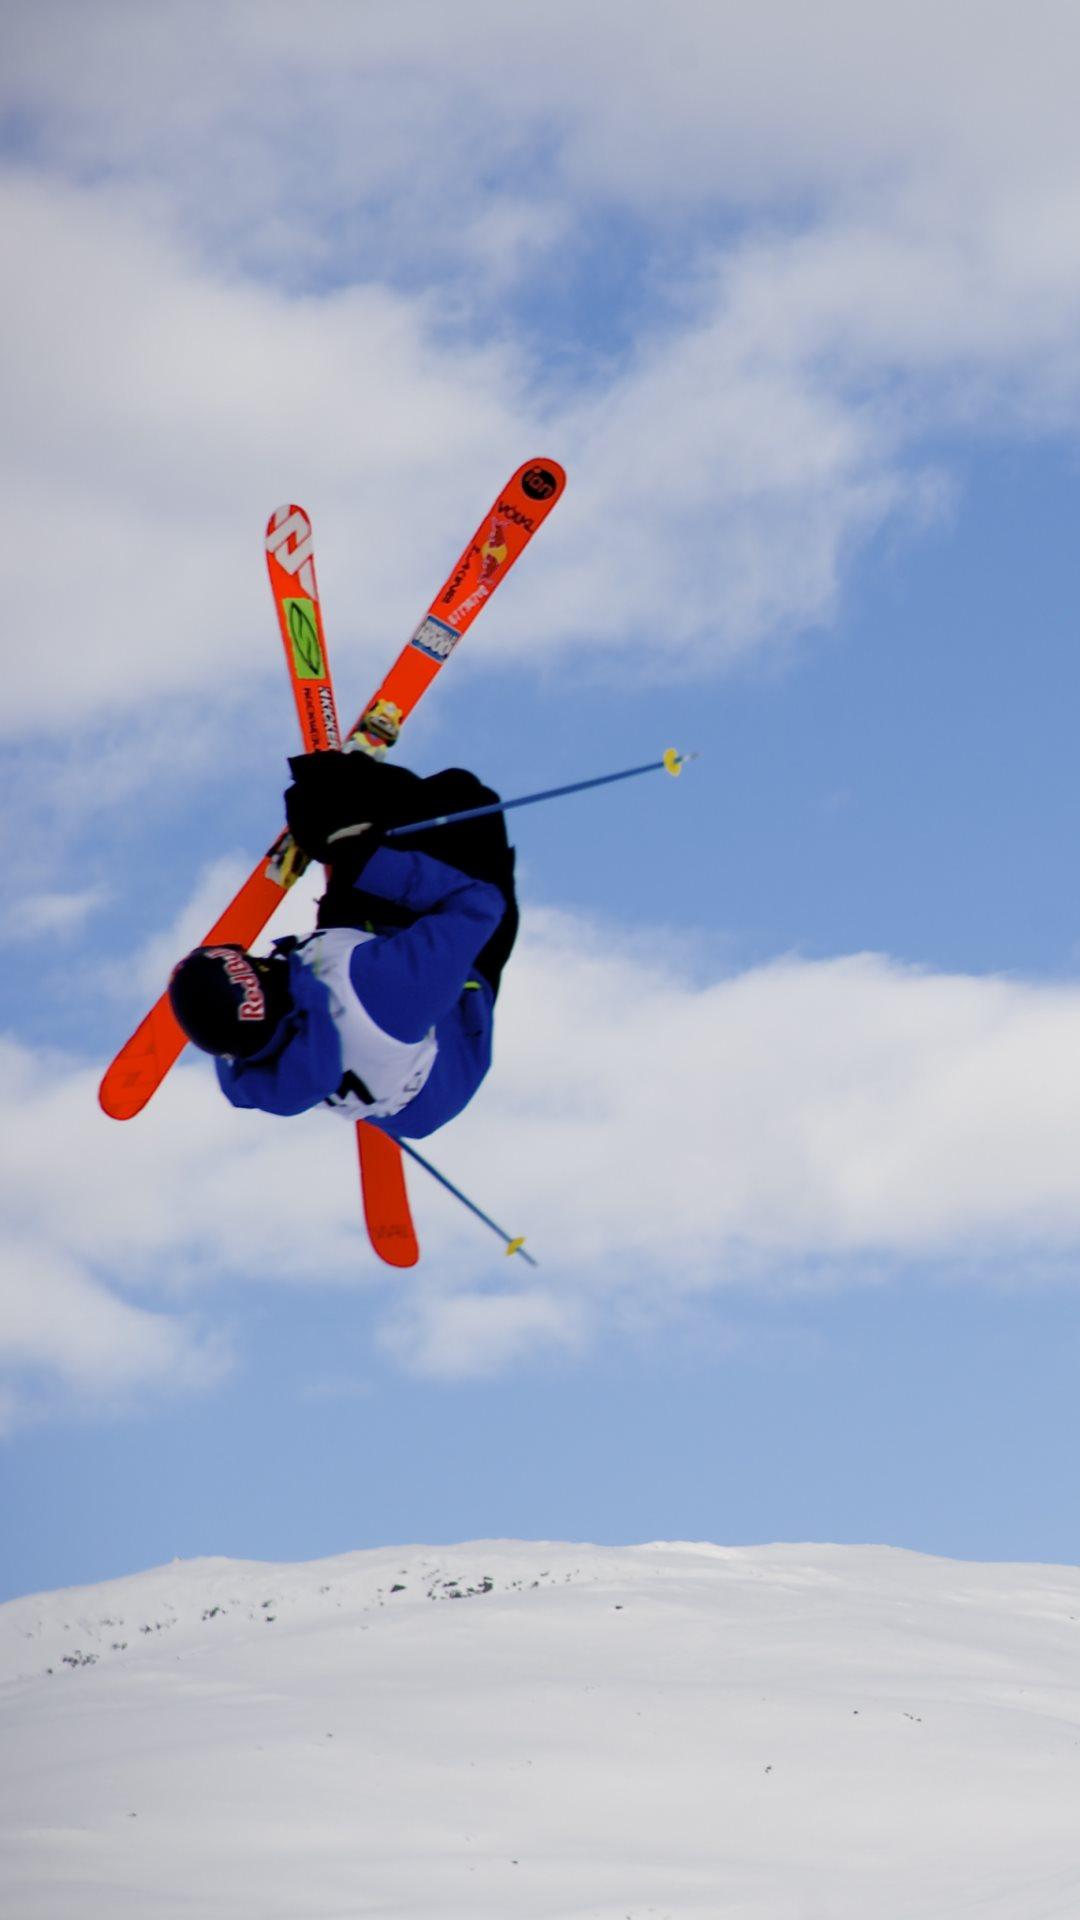 freestyle skiing wallpaper - photo #1